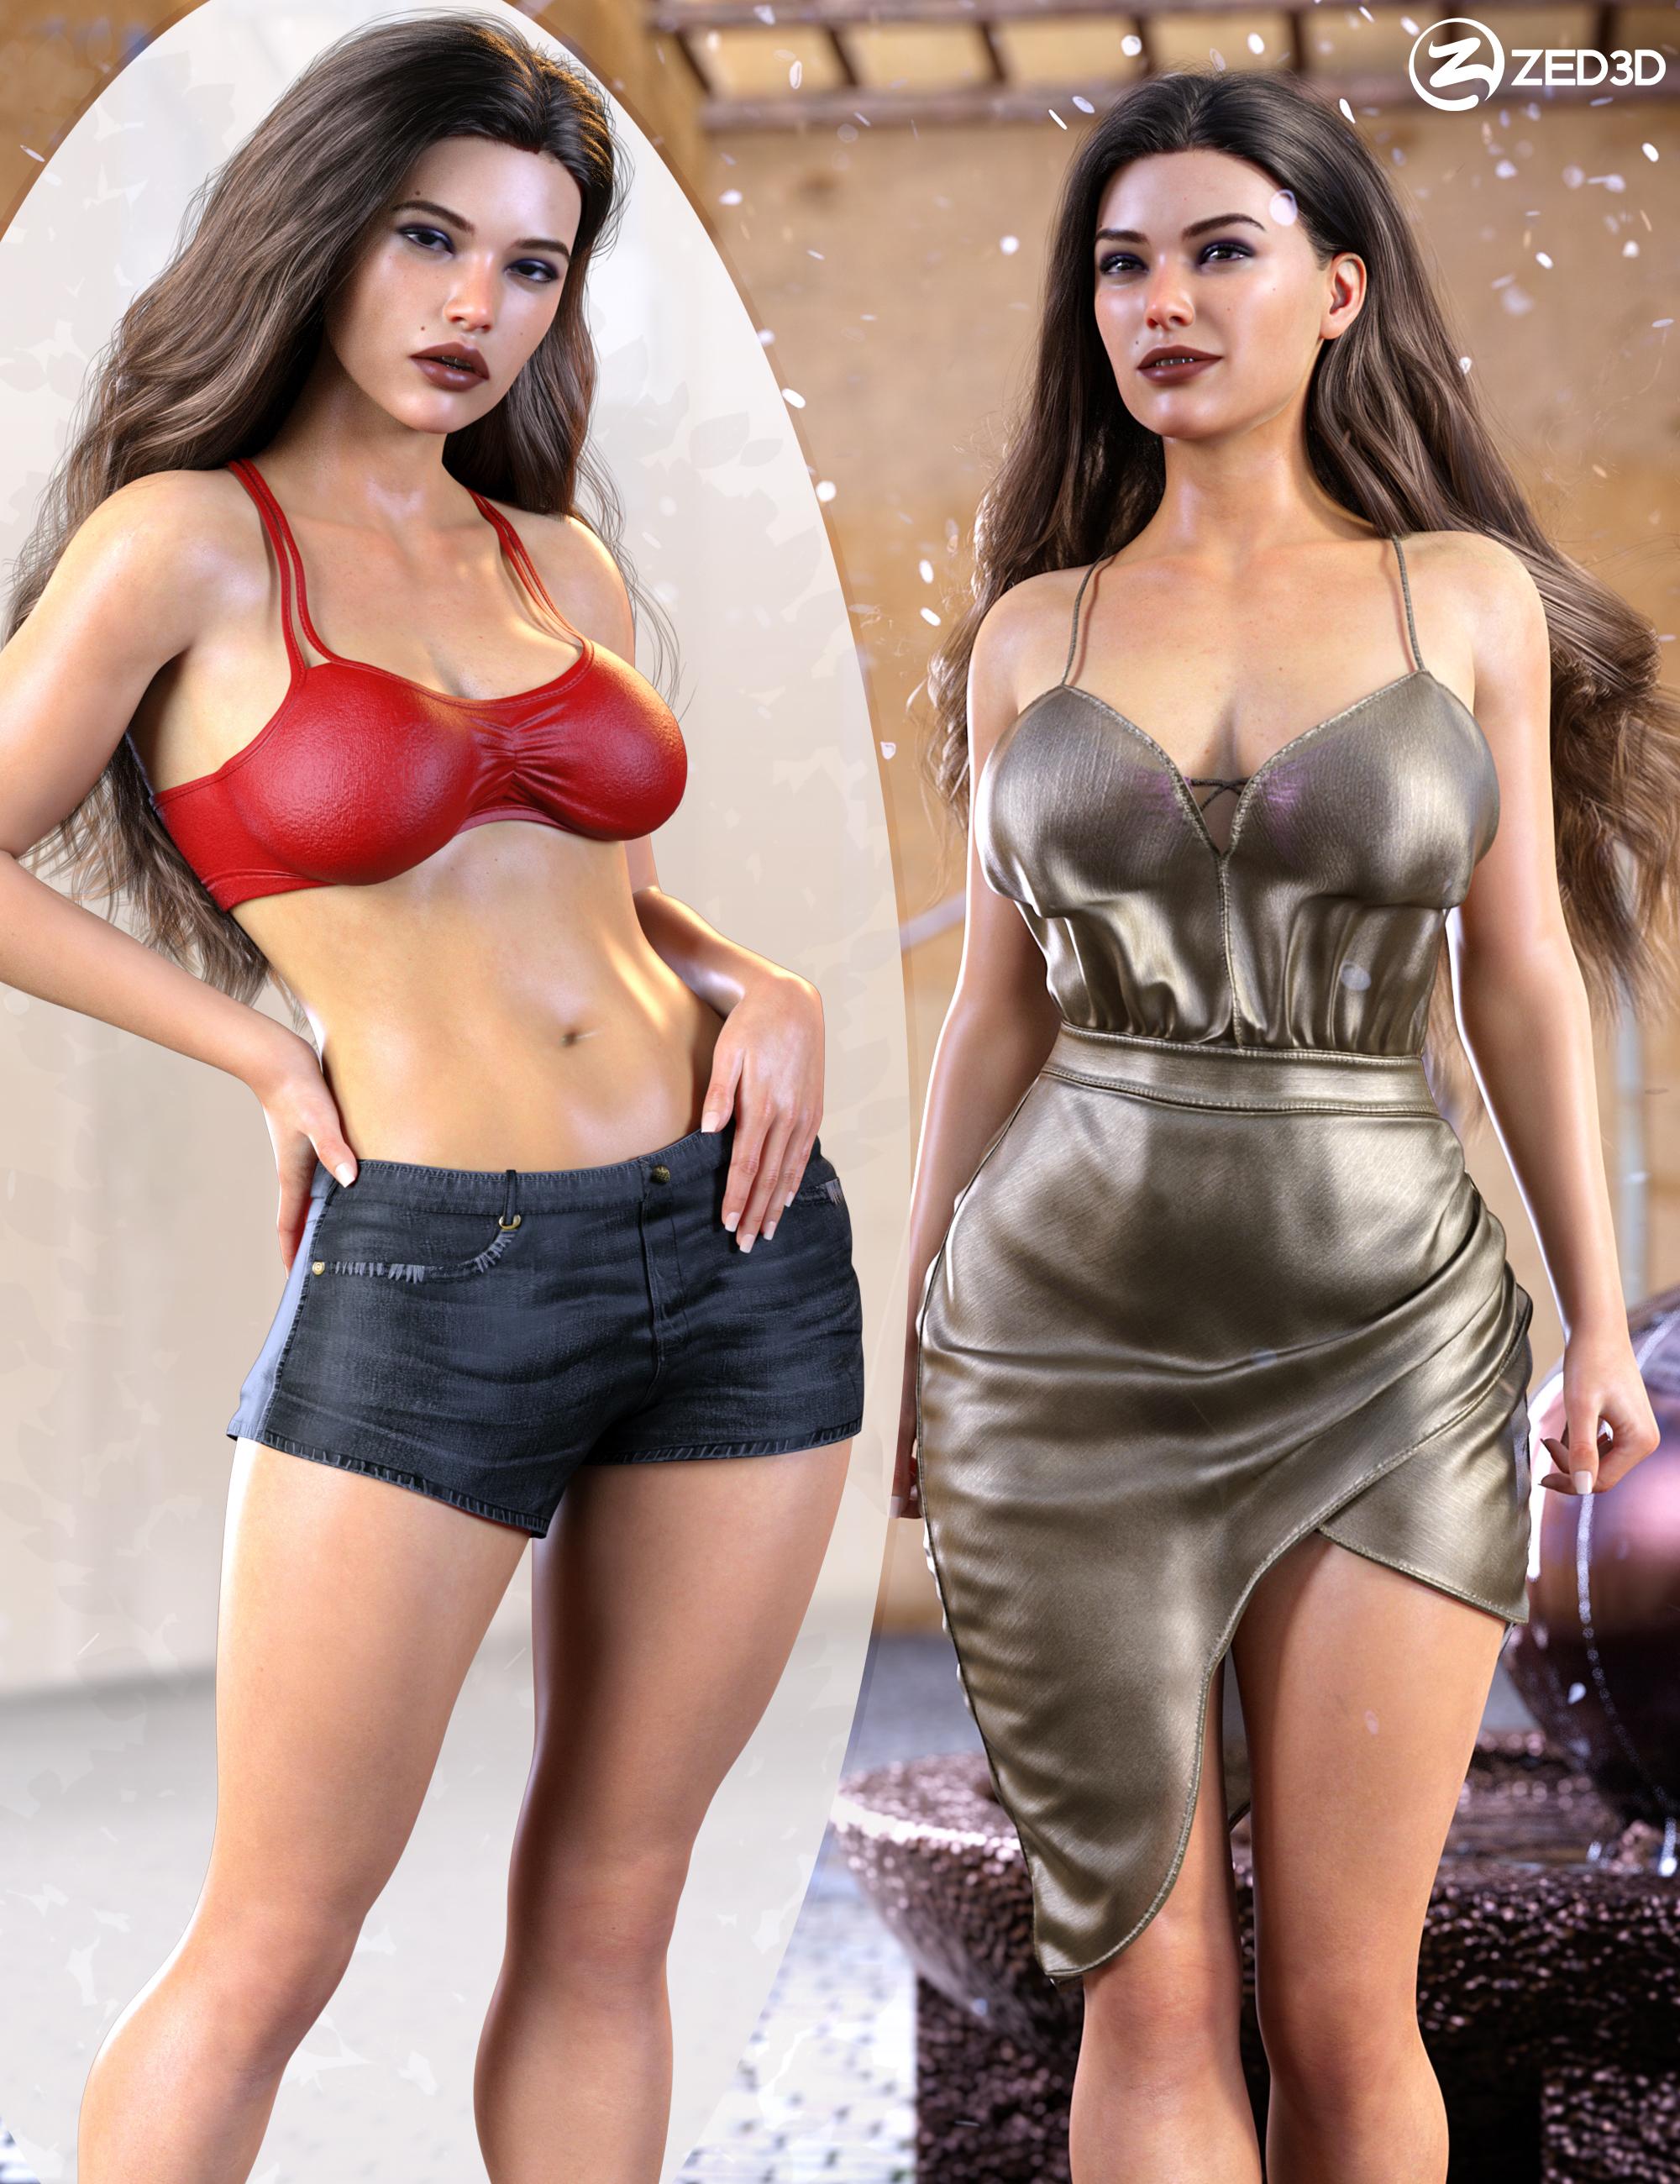 Z Exotic Beauty Shape and Poses Mega Set by: Zeddicuss, 3D Models by Daz 3D